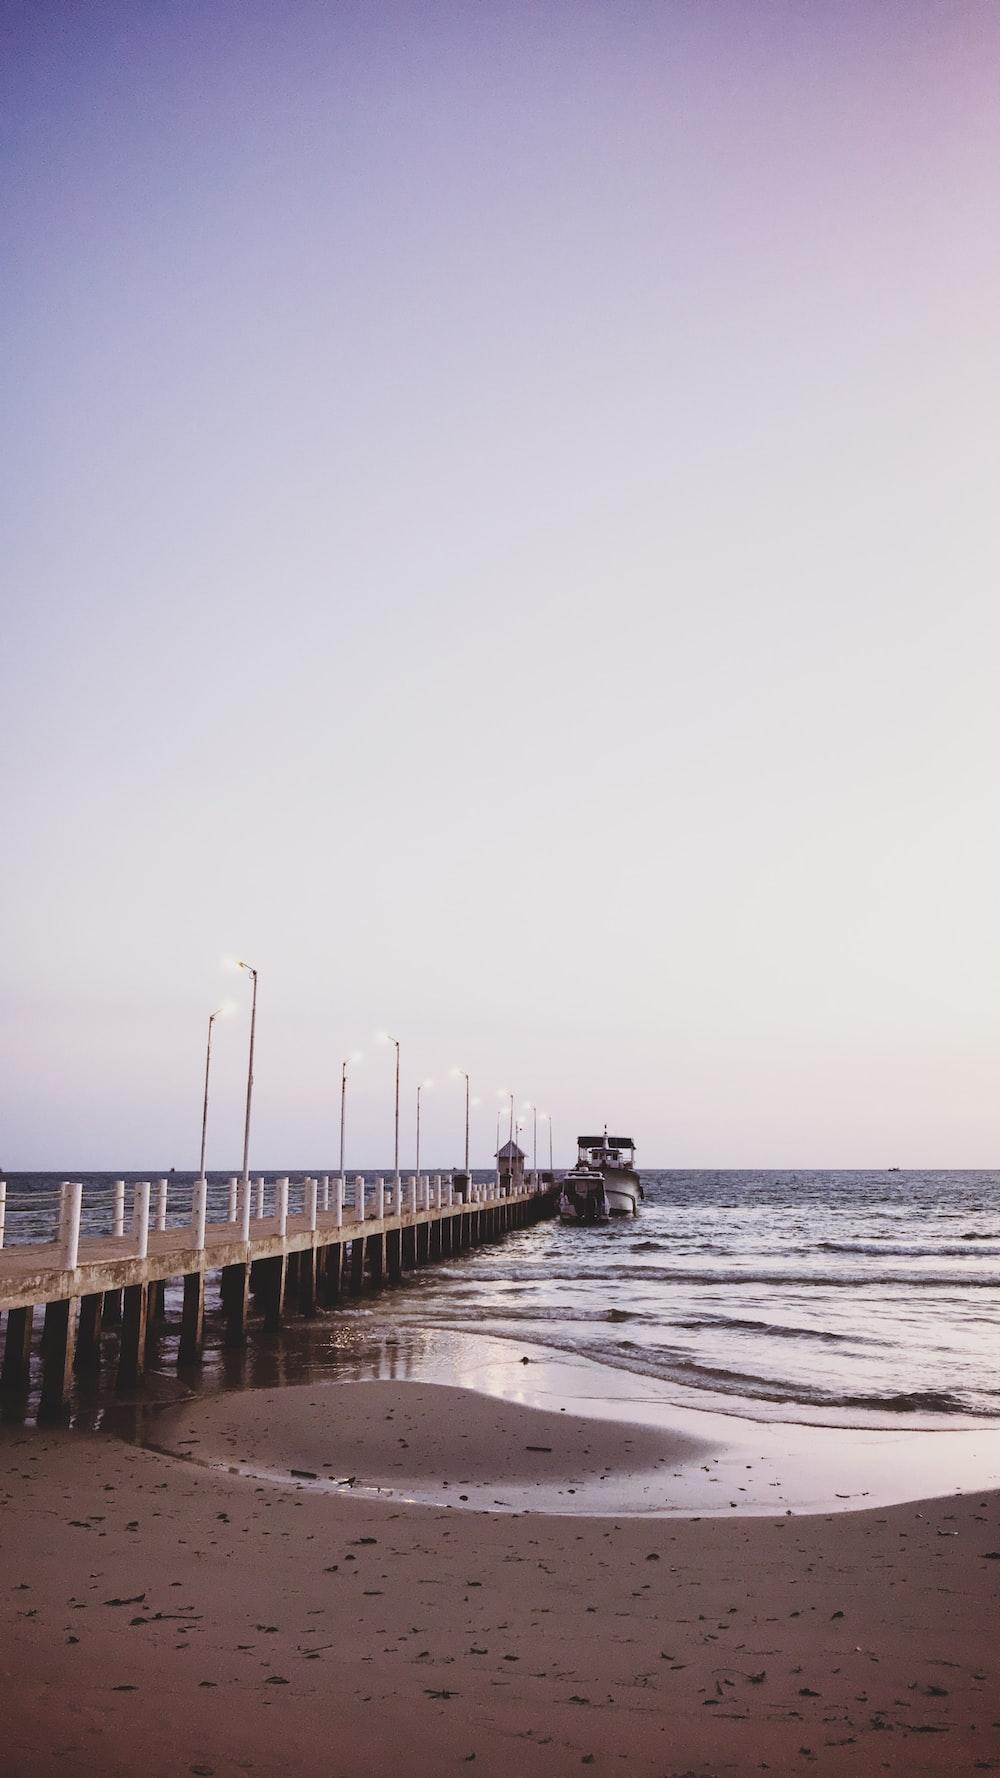 people walking on wooden dock during daytime